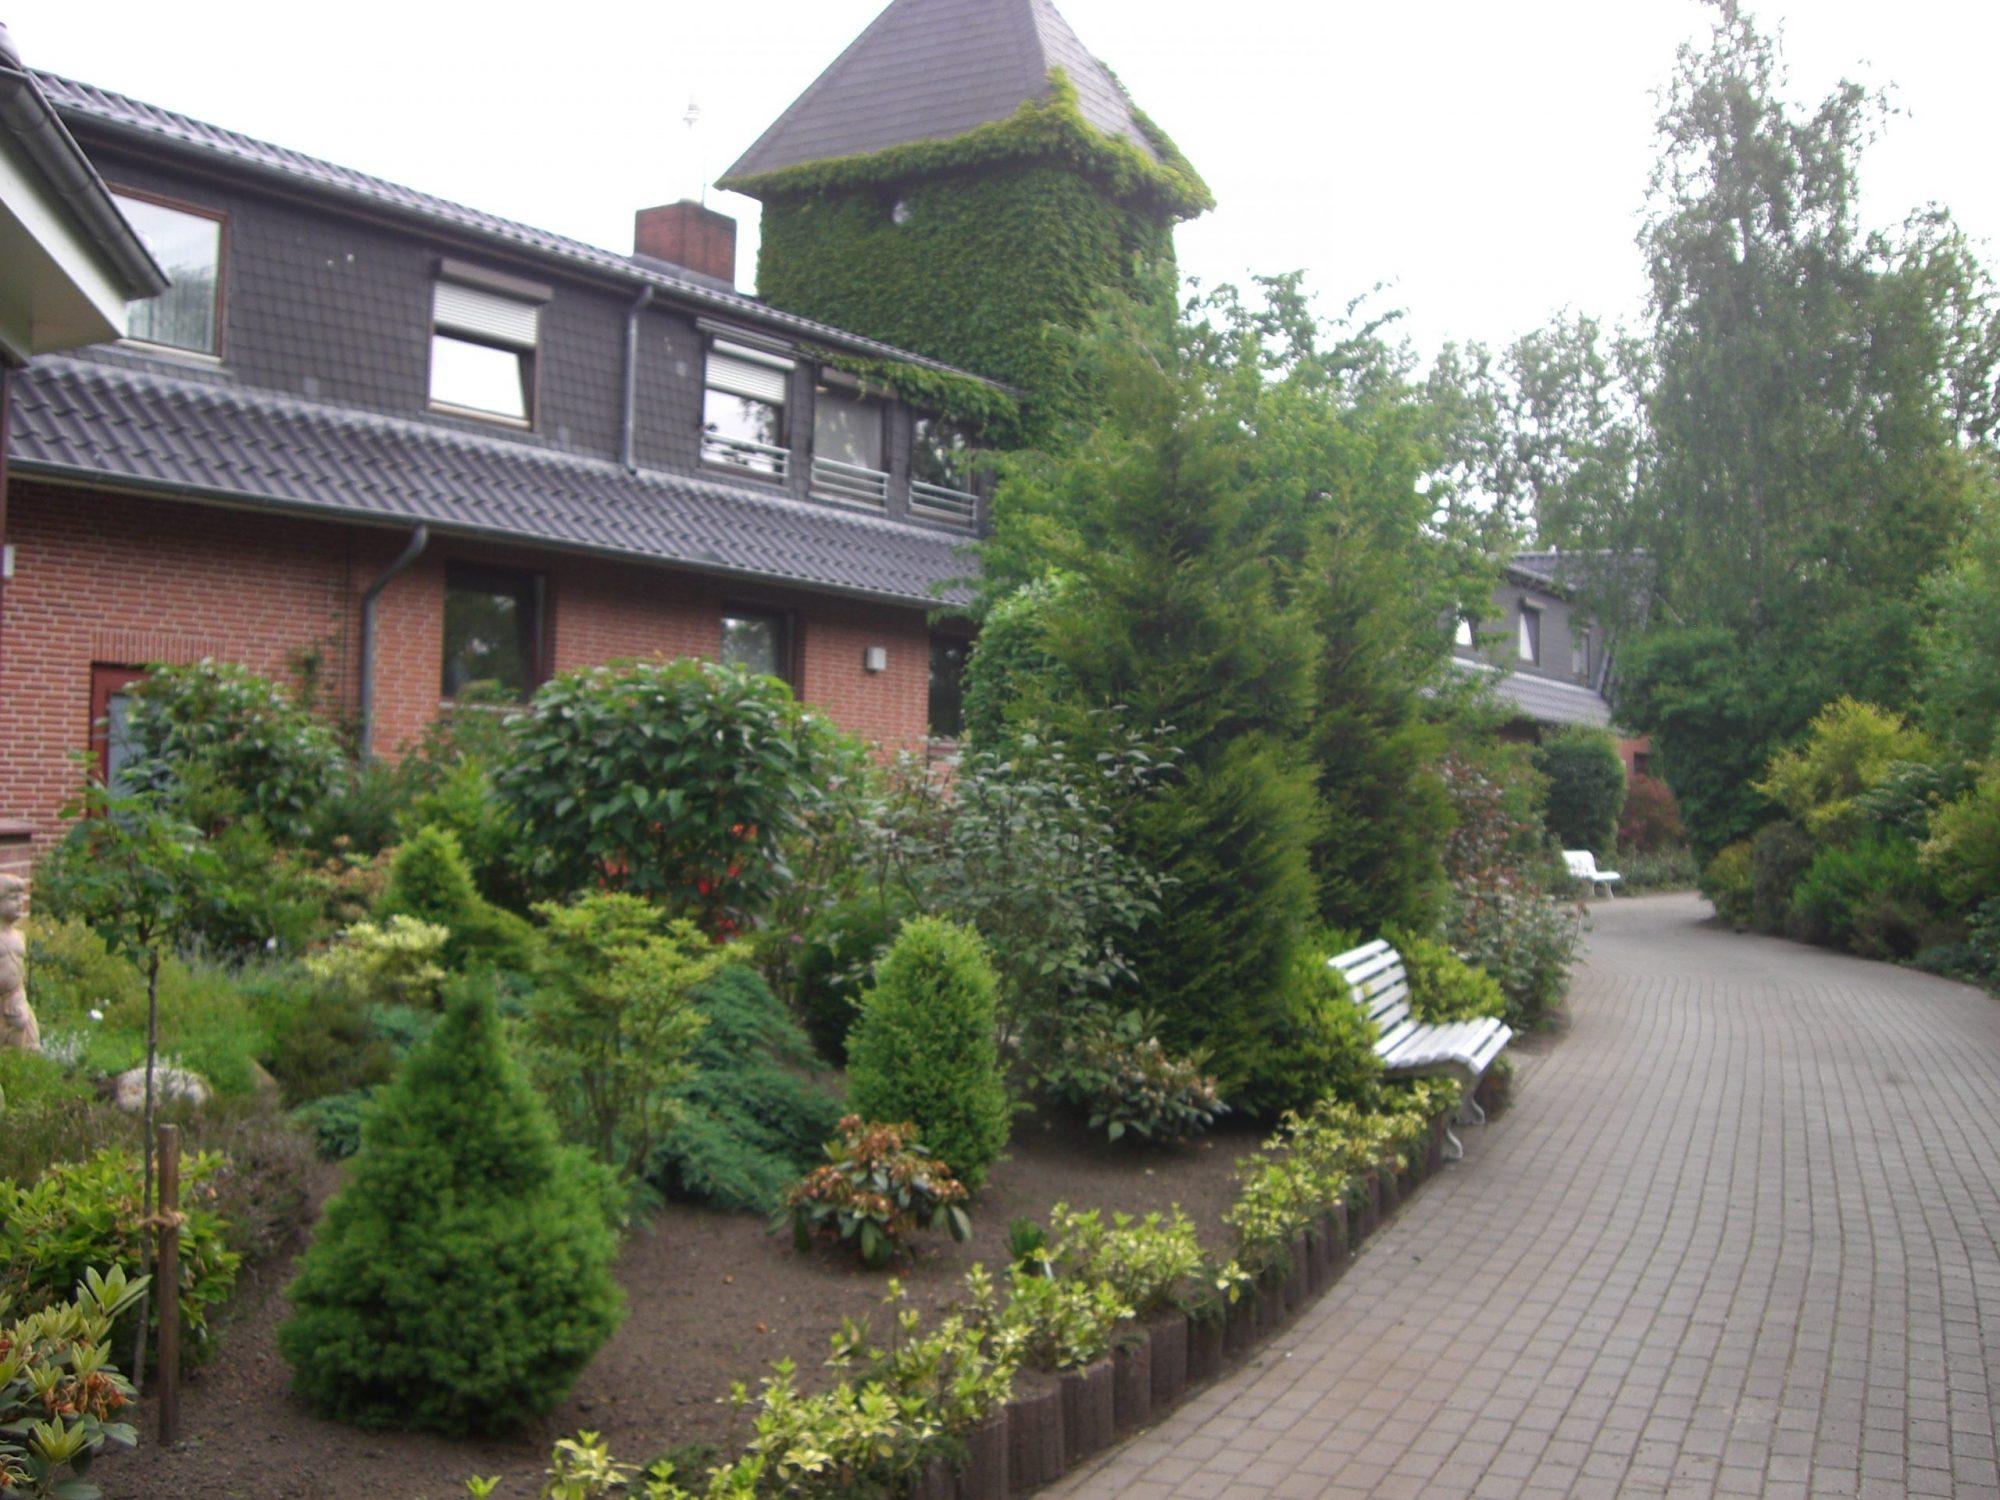 Haus_Garten_1